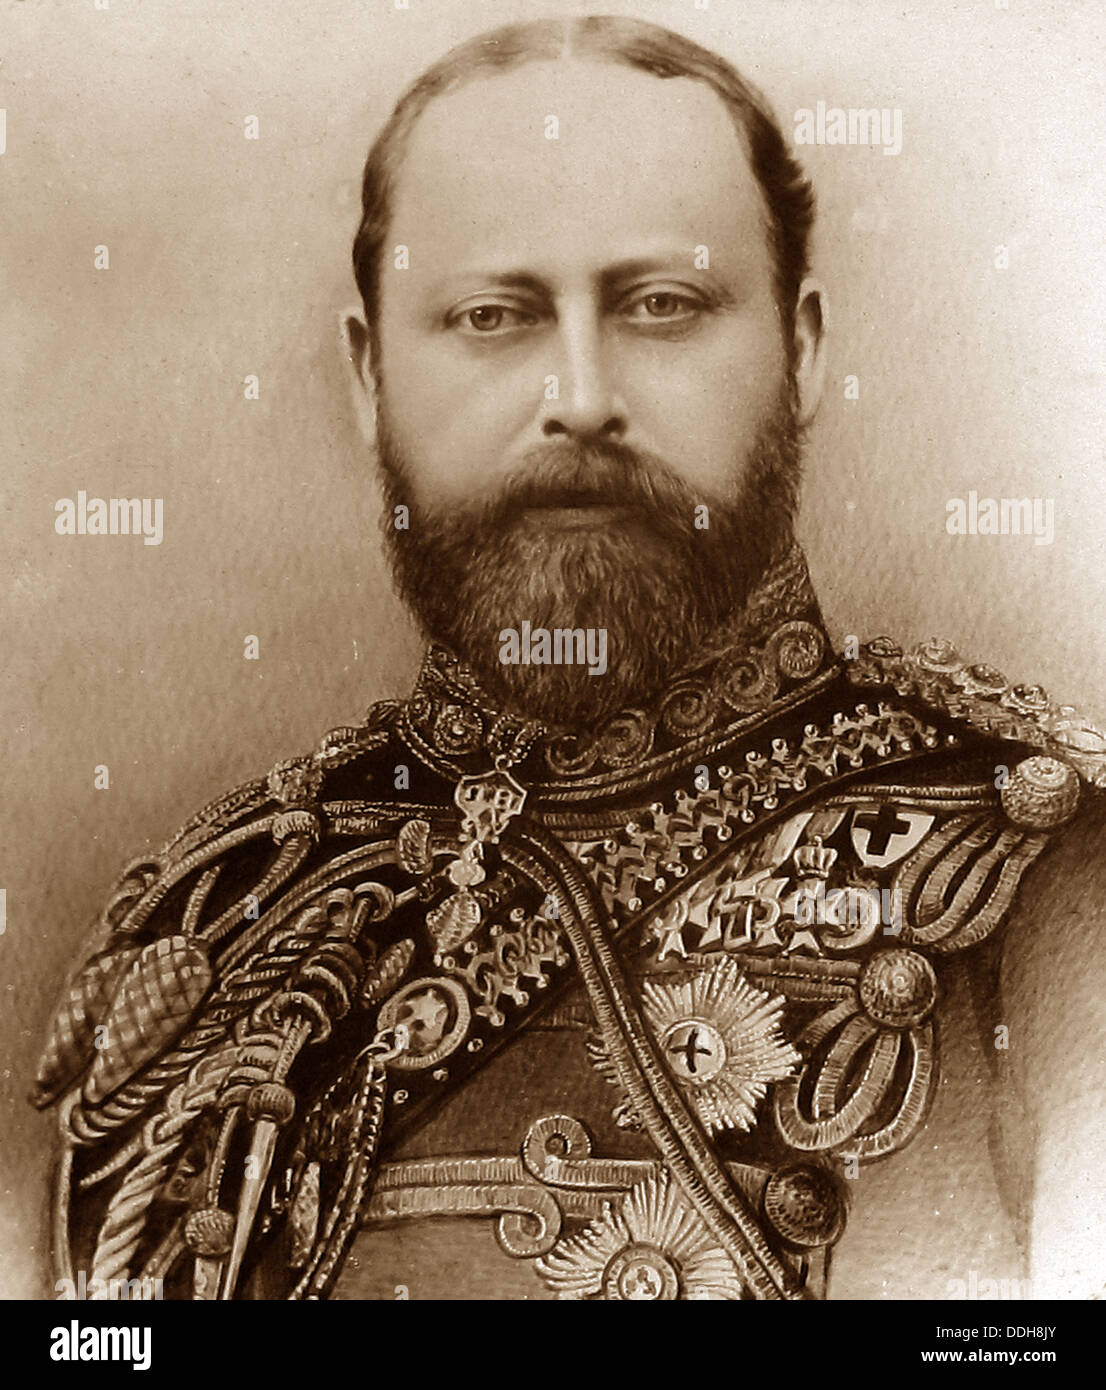 King Edward VII portrait early 1900s - Stock Image